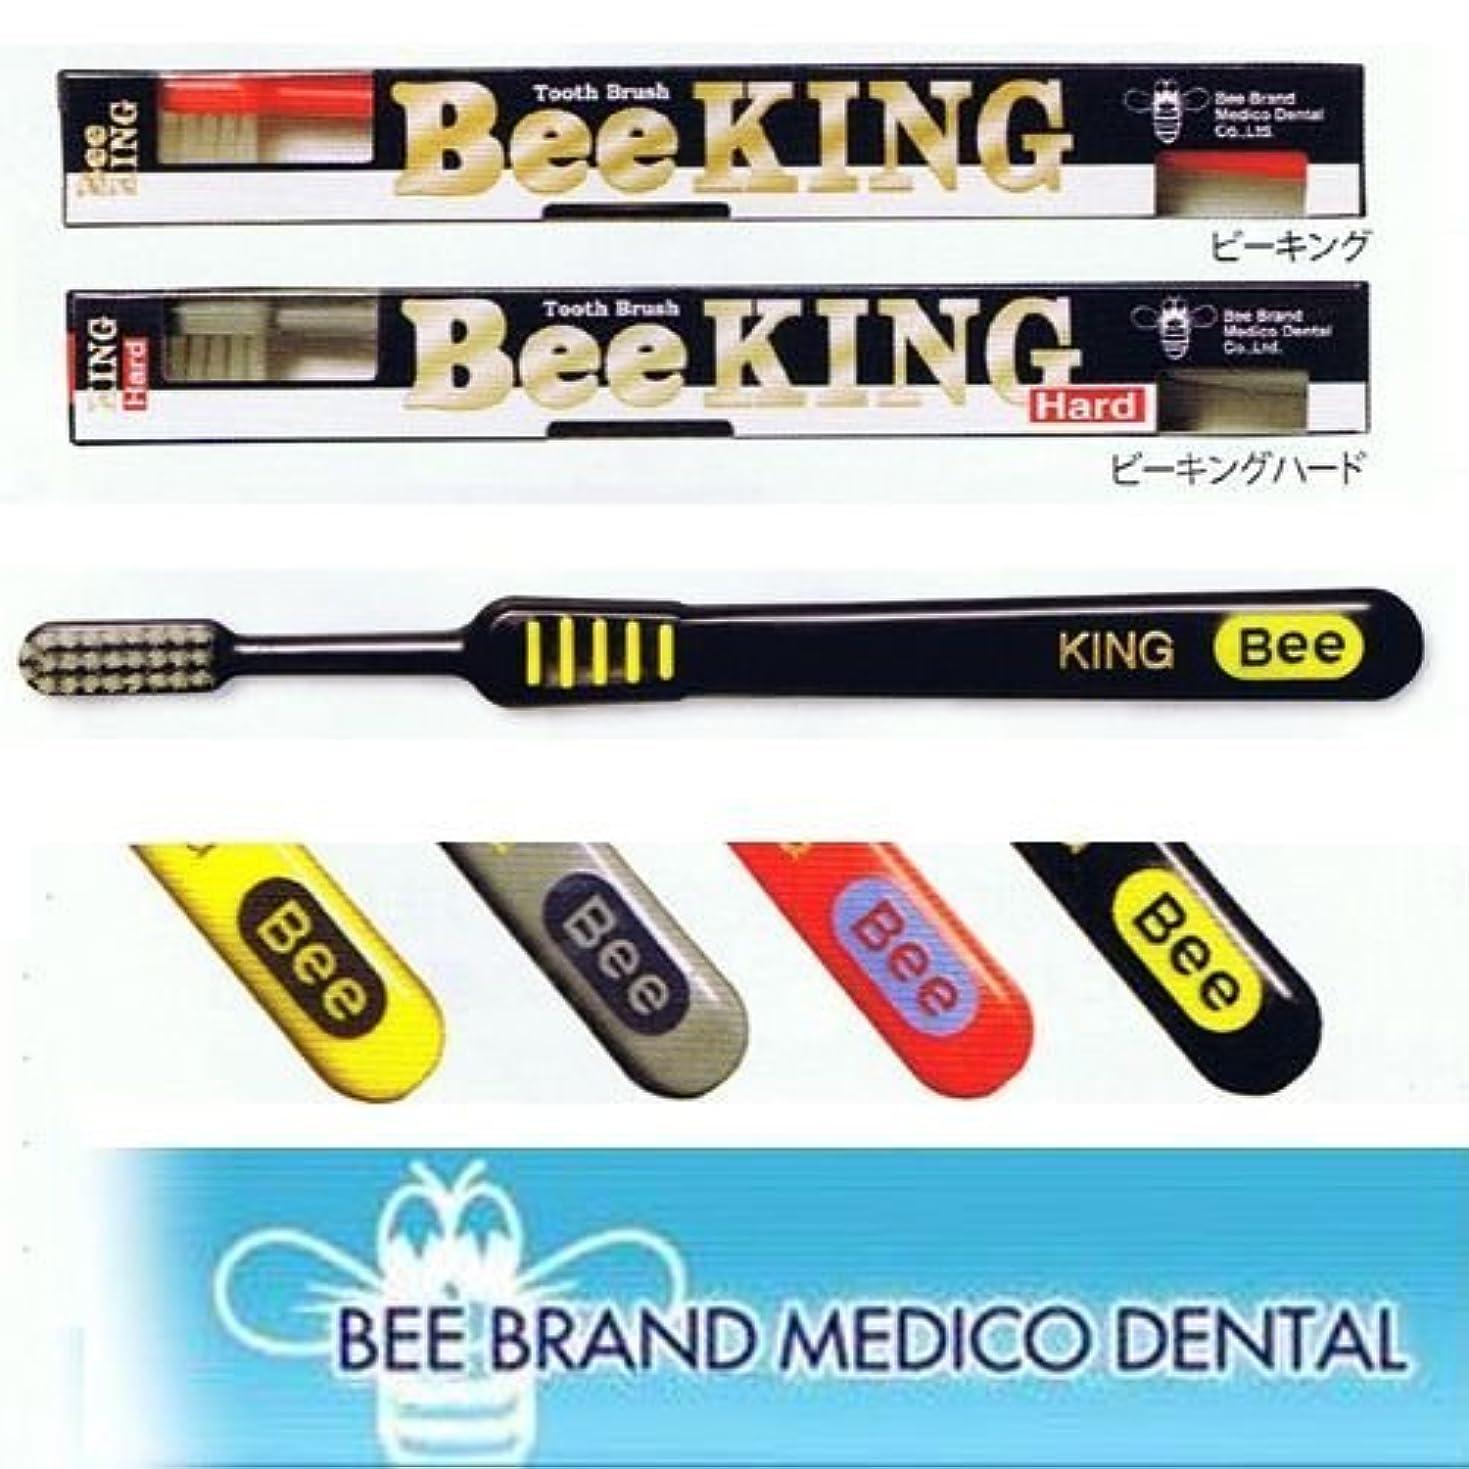 BeeBrand Dr.BEE 歯ブラシ キング ふつう